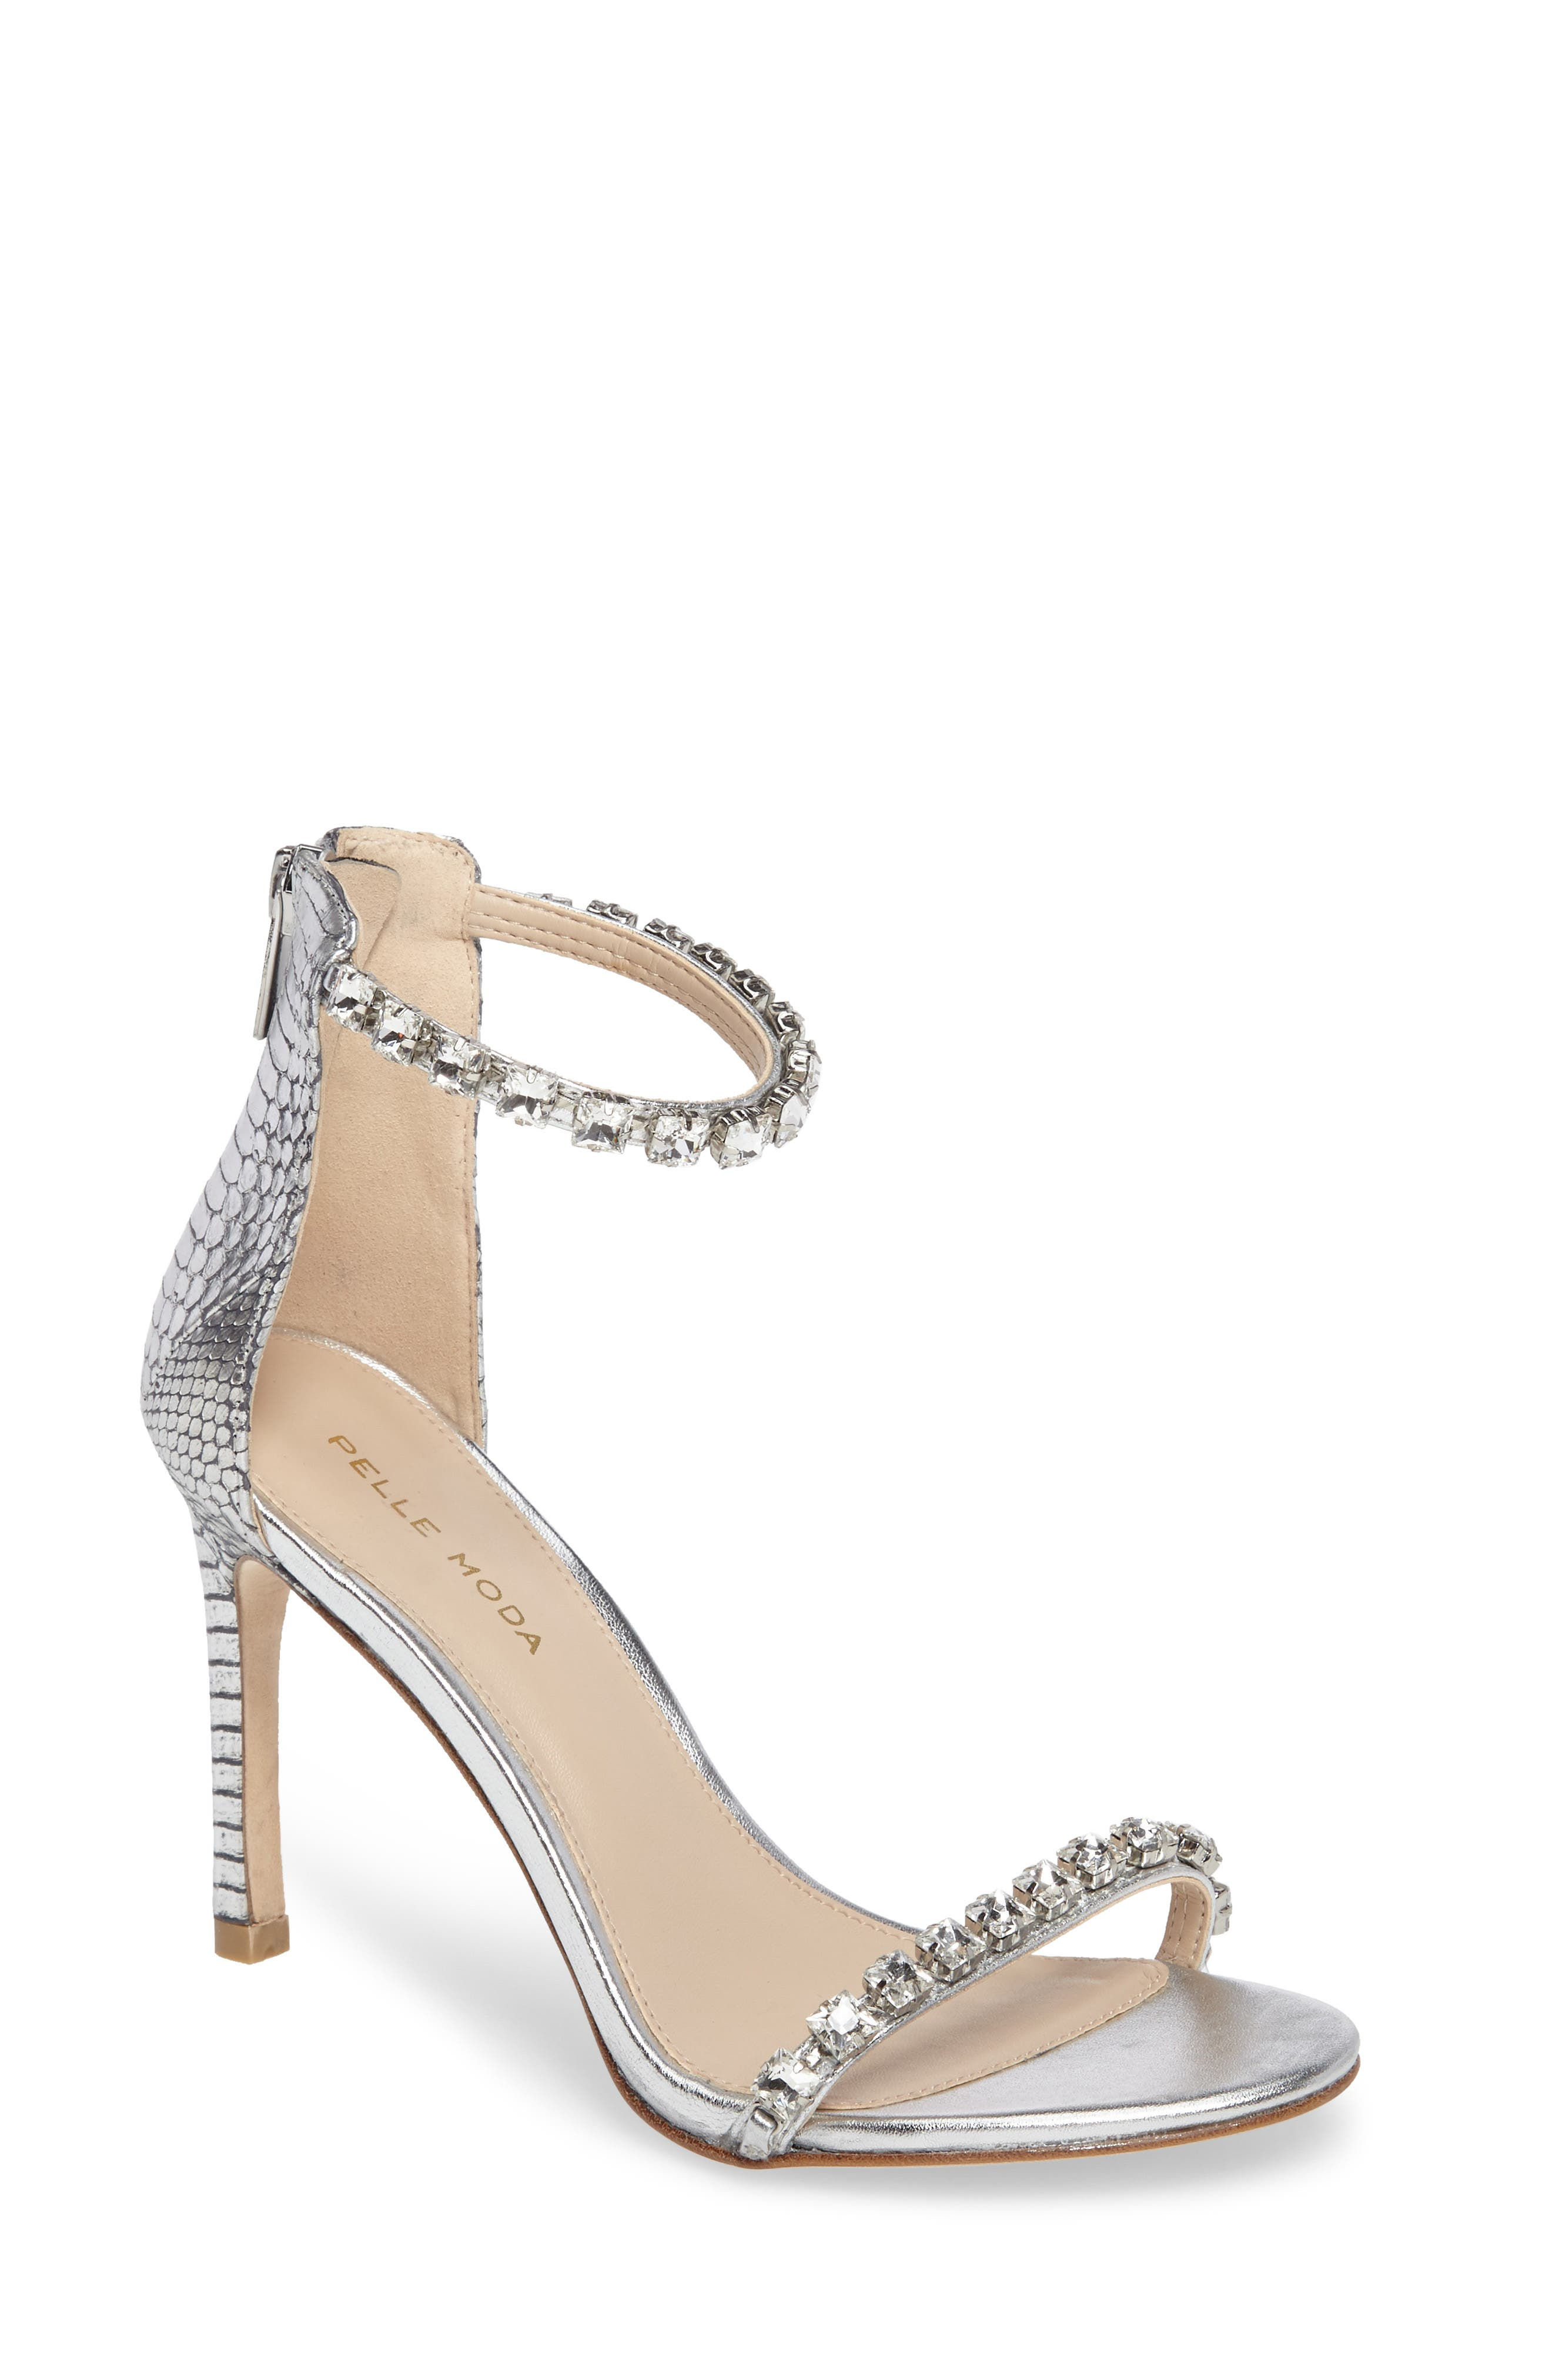 Alternate Image 1 Selected - Pelle Moda Frisk Embellished Sandal (Women)